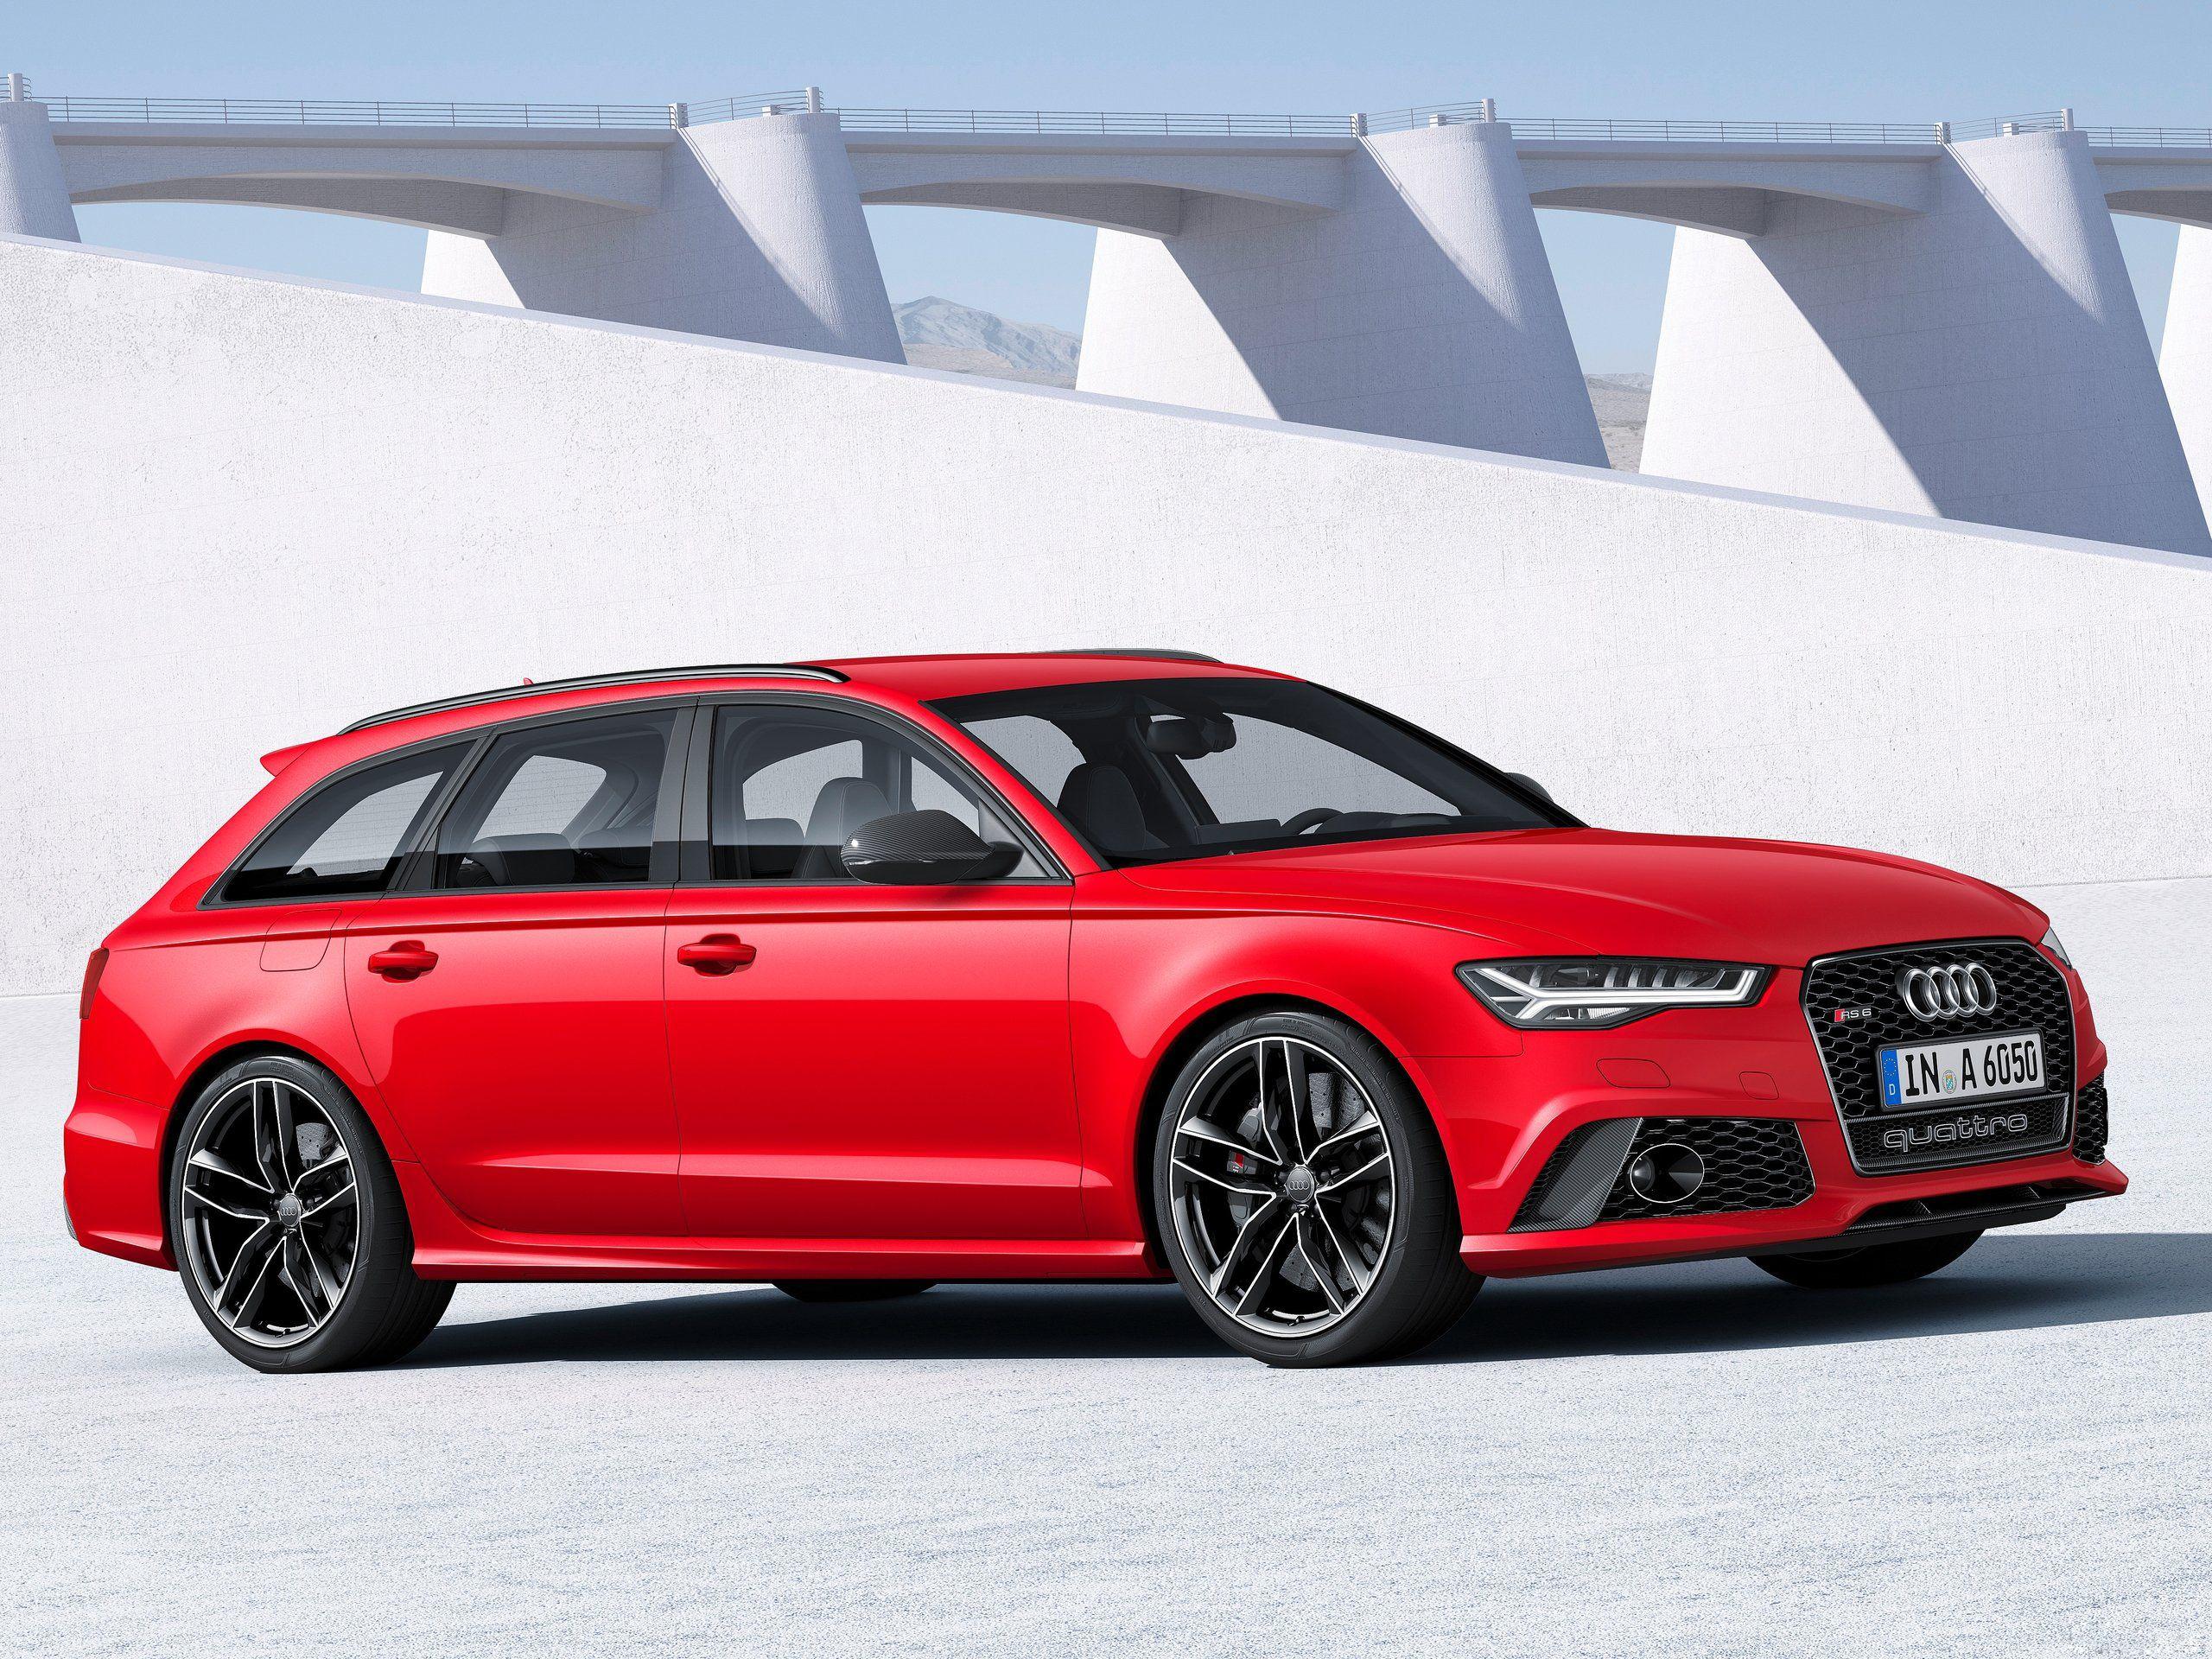 Audi rs6 avant 2015 wallpaper